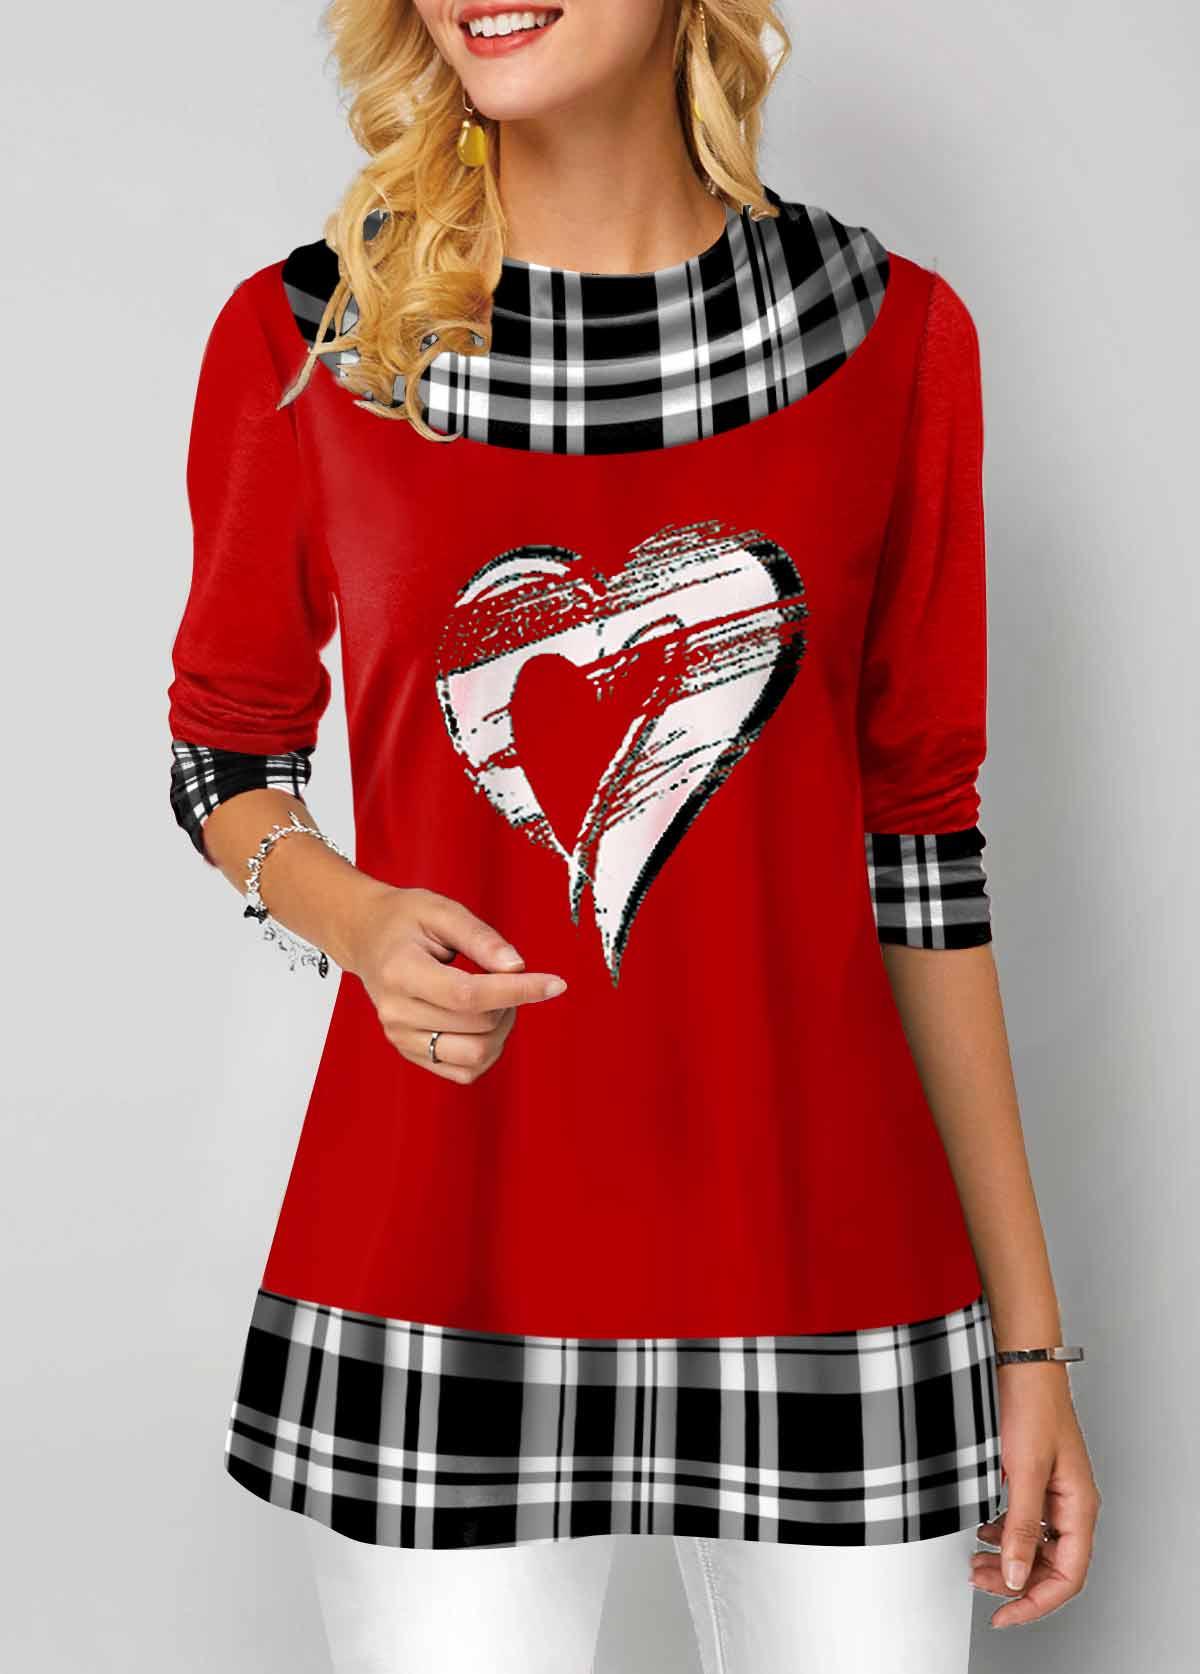 Long Sleeve Heart and Plaid Print T Shirt